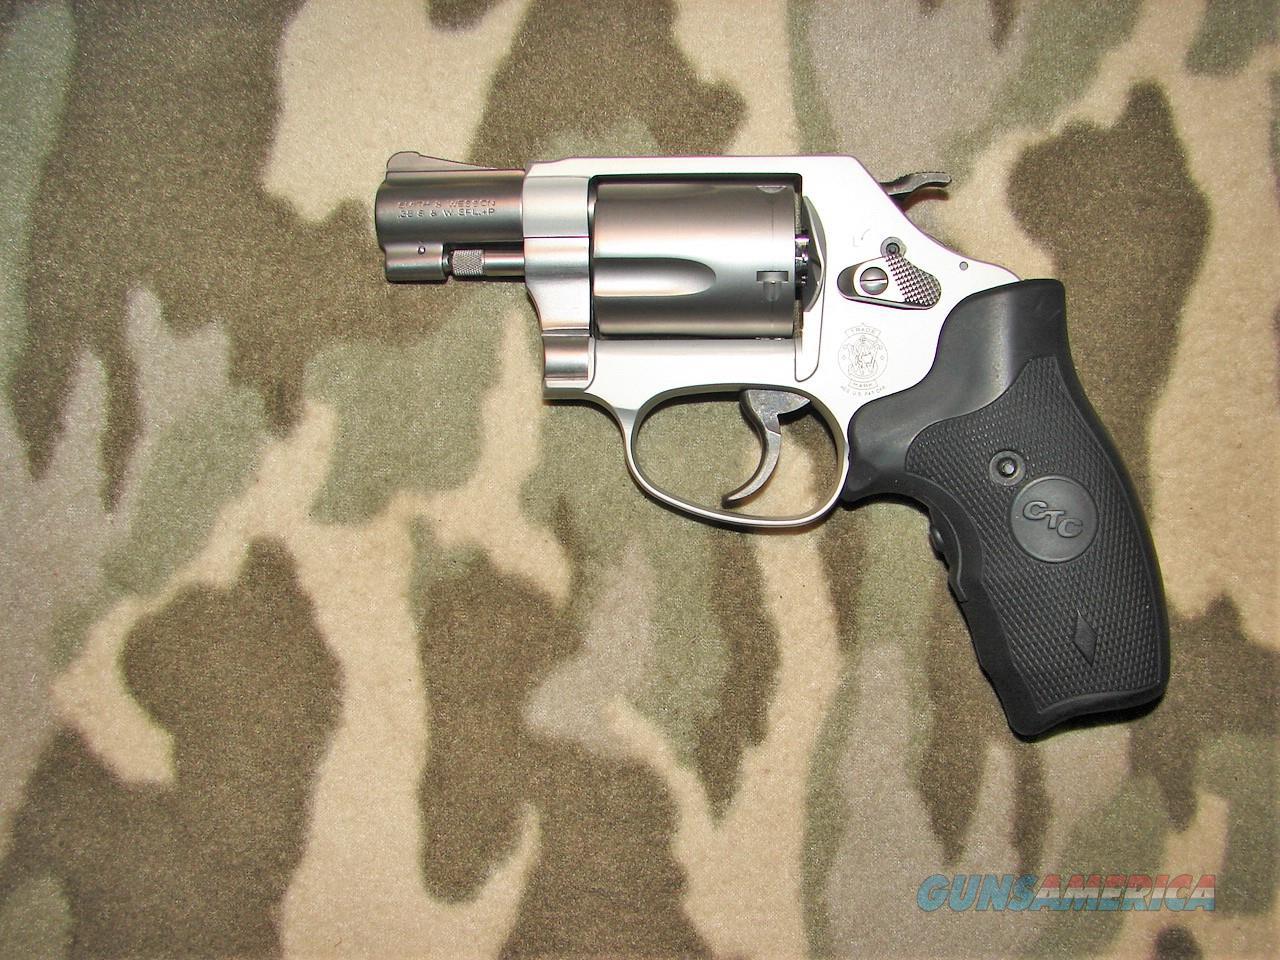 Smith & Wesson 637-2 Crimson Trace  Guns > Pistols > Smith & Wesson Revolvers > Small Frame ( J )